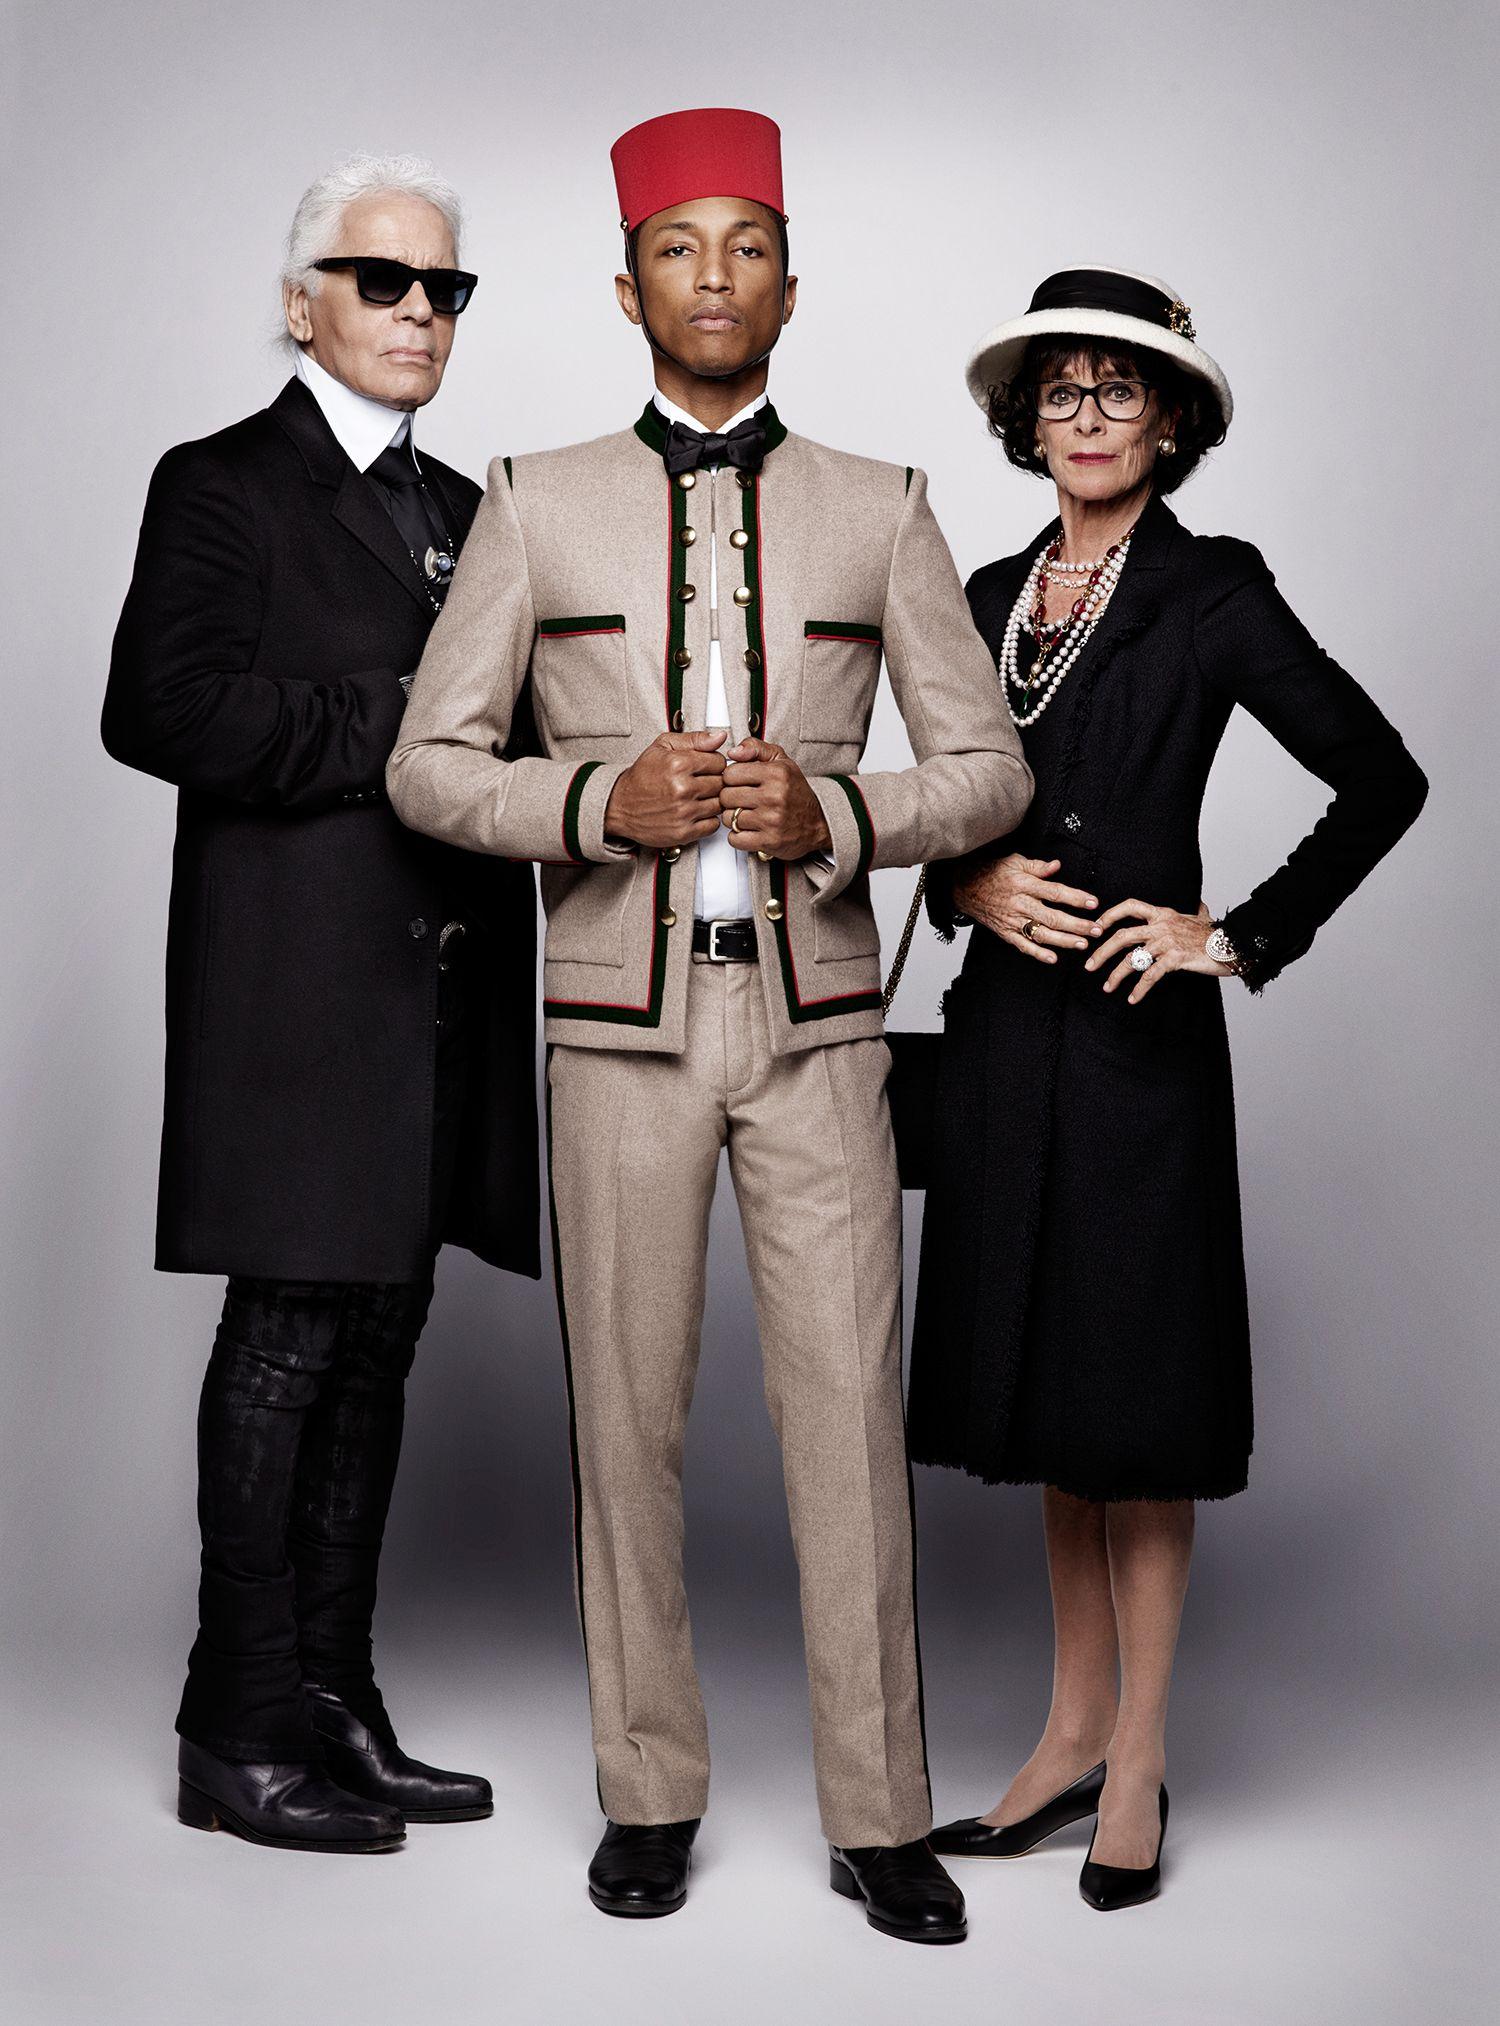 da0a0af03 Cara Delevingne et Pharrell Williams envoûtent la nouvelle campagne de  Chanel